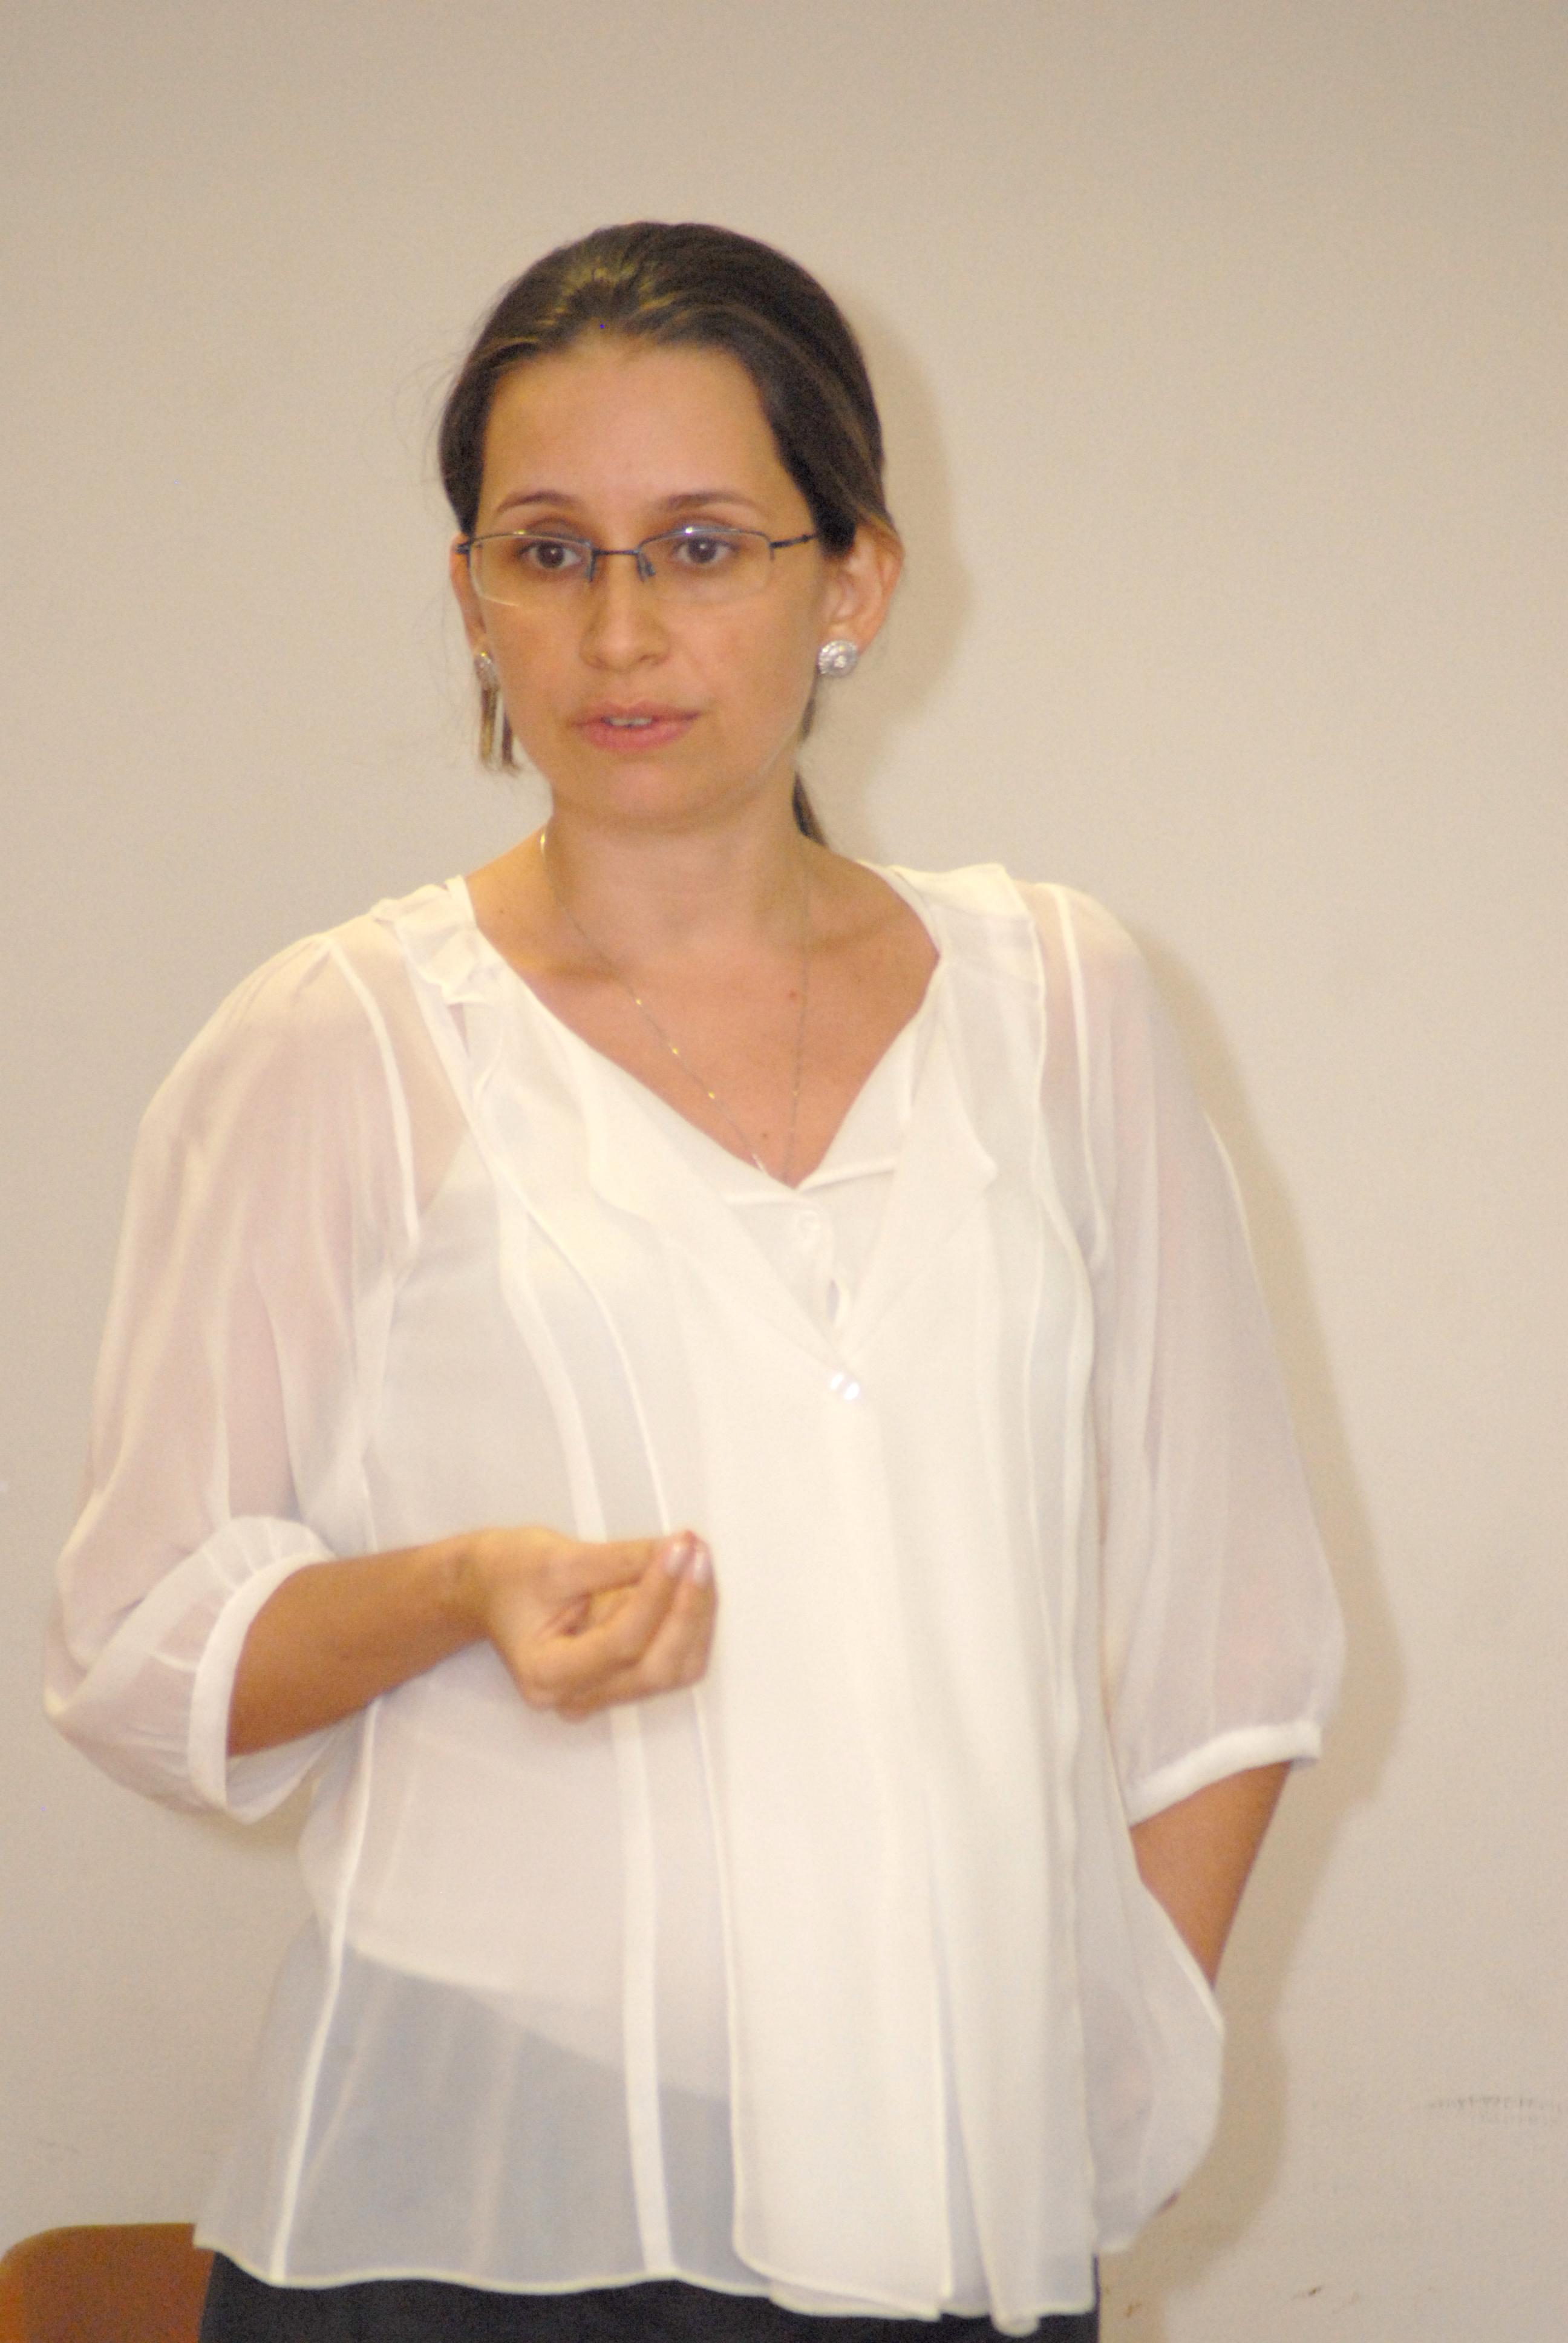 Lilian Resende - Isabella Lucas/UFMG